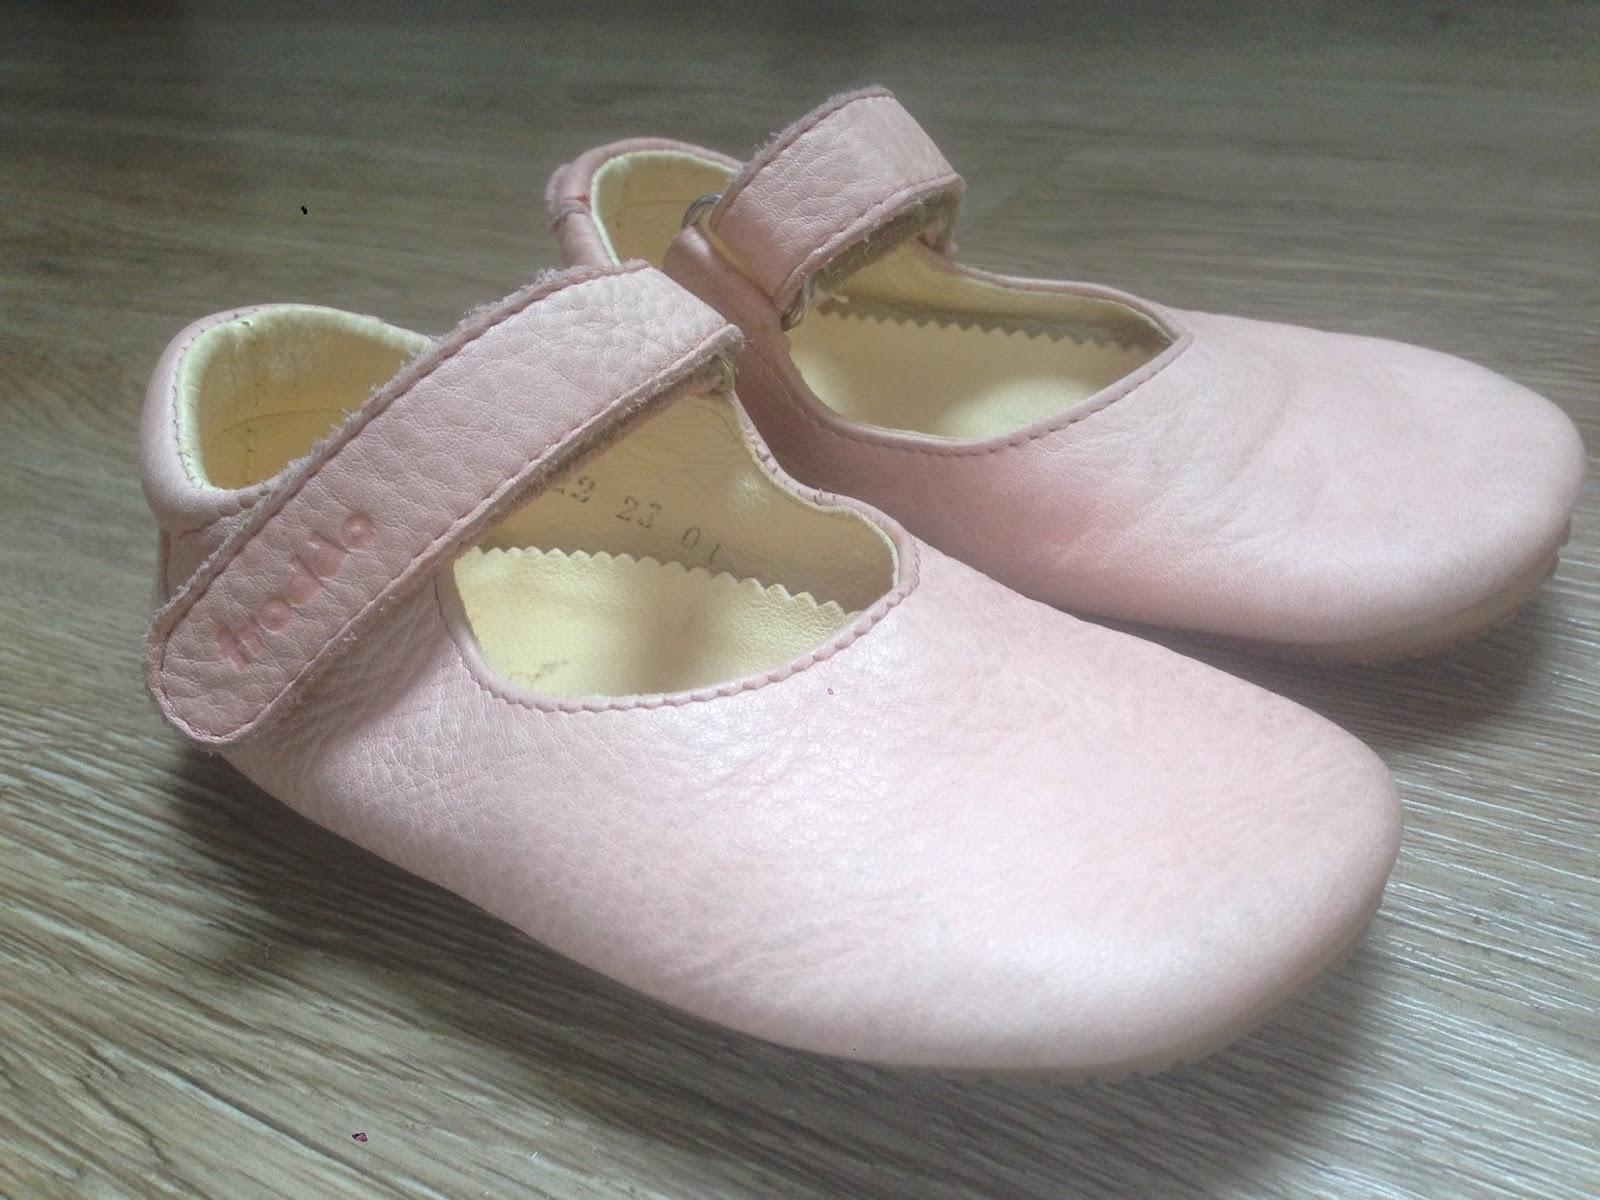 29d71ac729b Froddo Prewalkers  barefoot capáčkovité botky ve velikostech 17-24